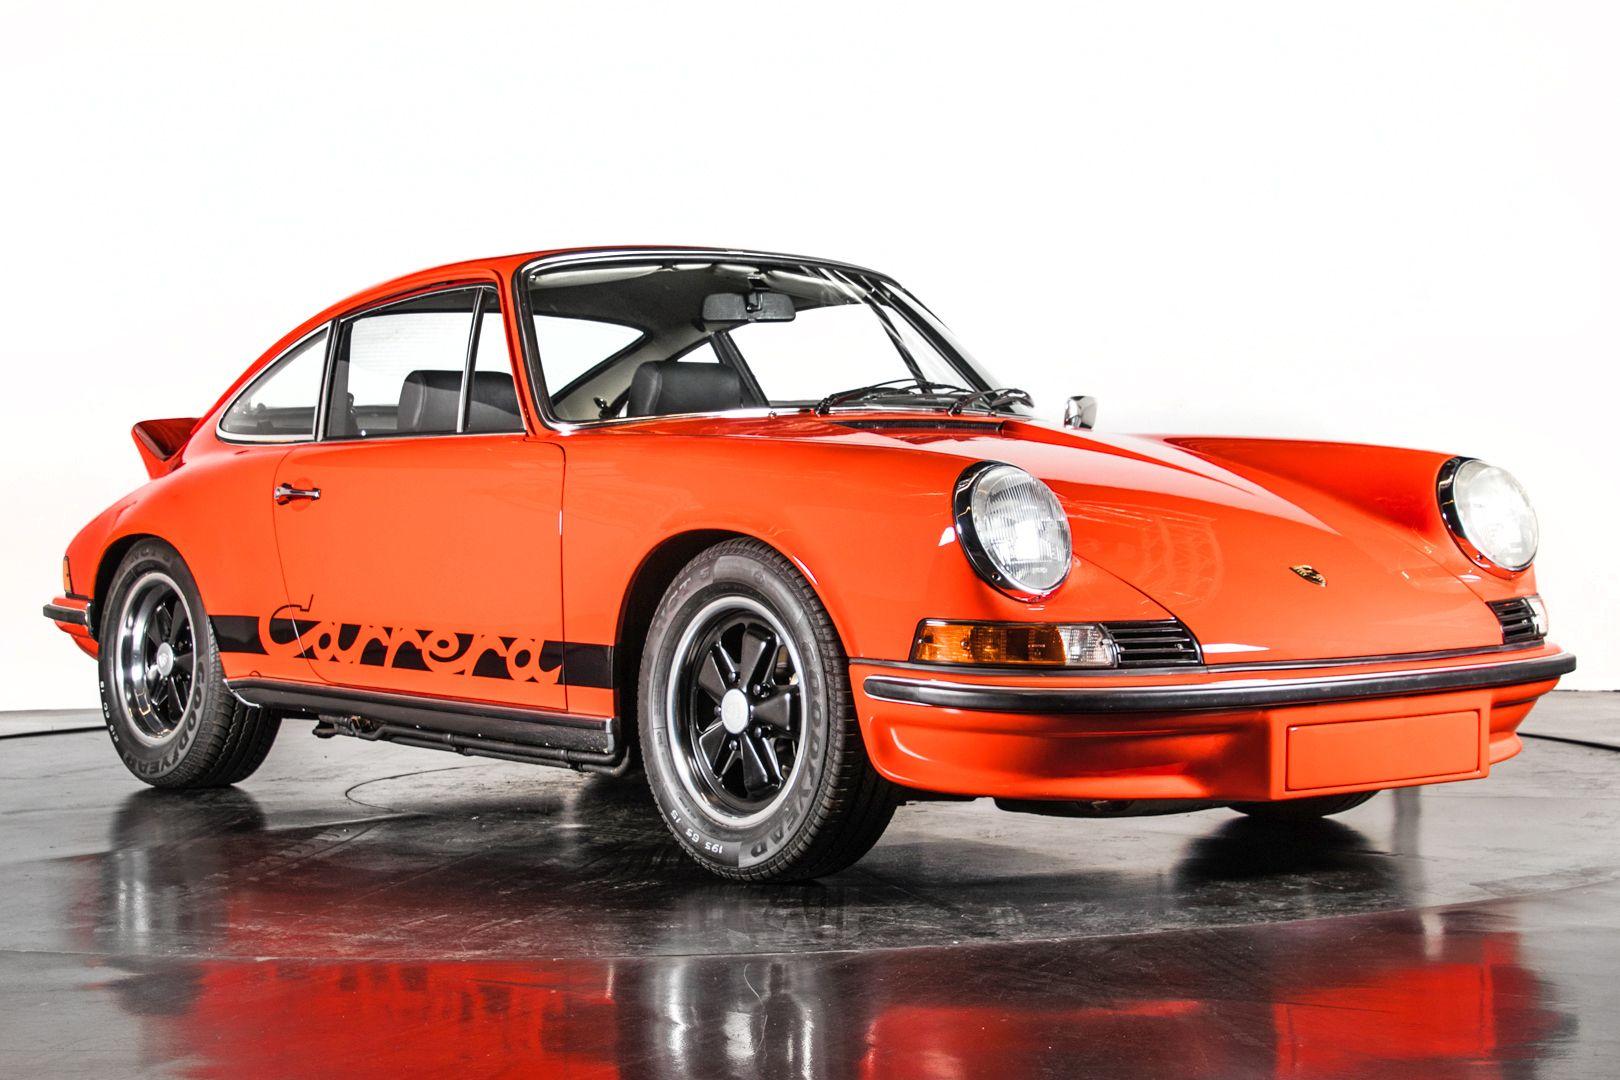 1973 Porsche 911 Carrera 2.7 RS 44398